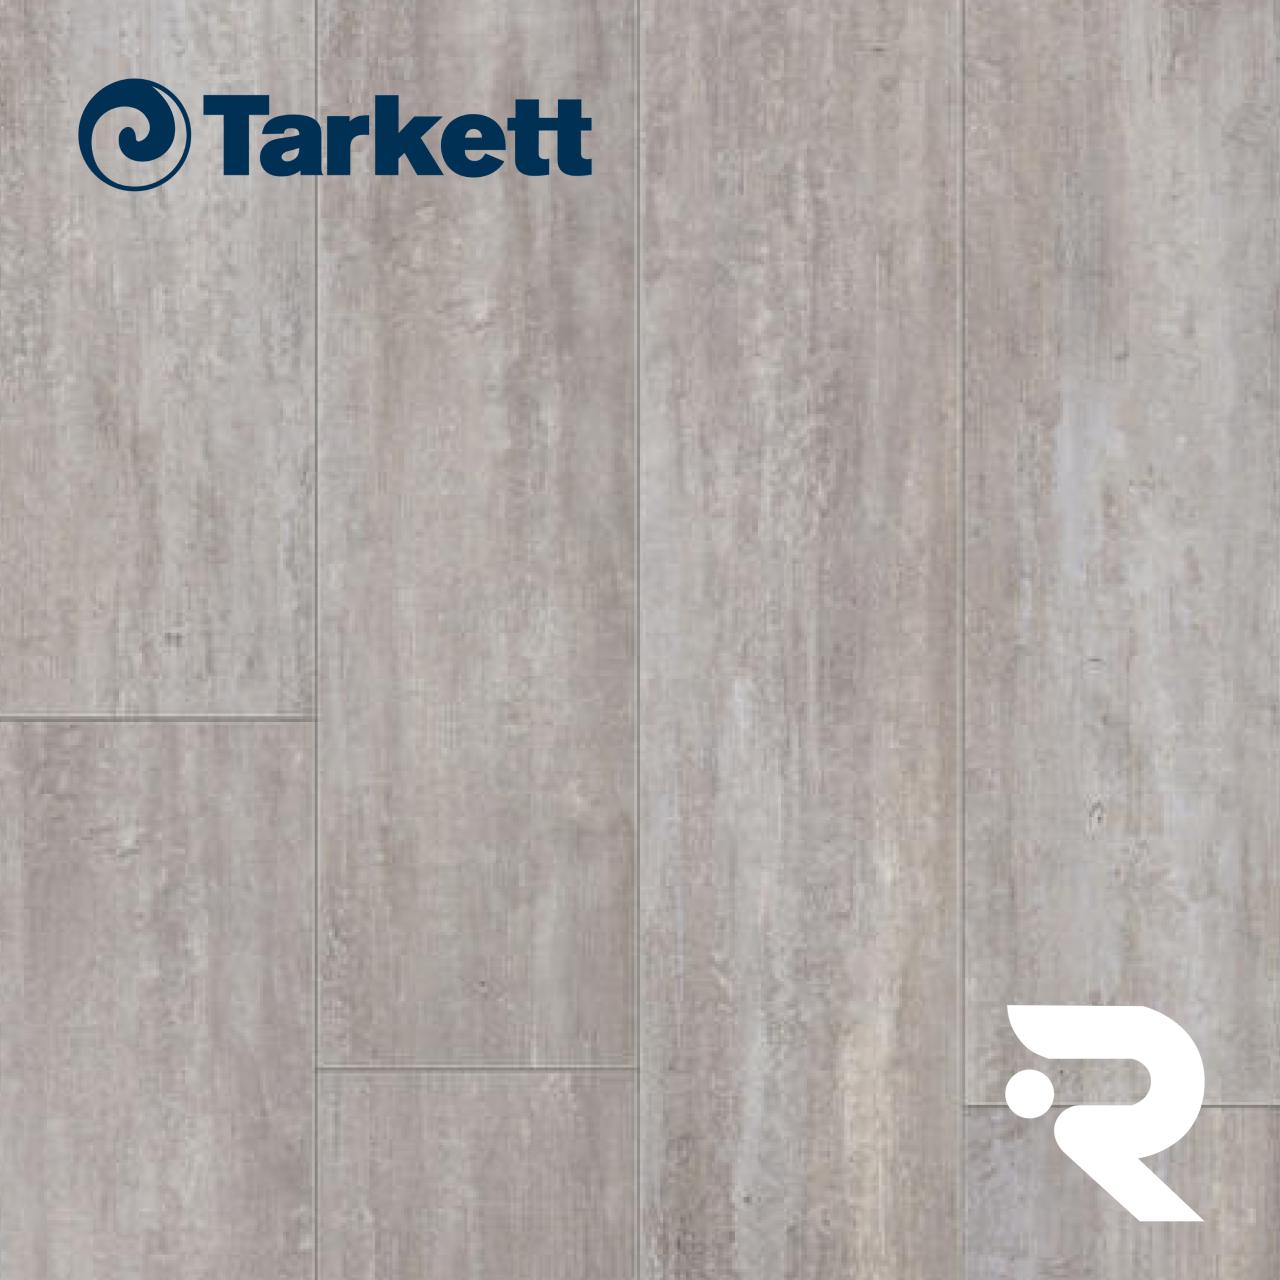 🌳 ПВХ плитка Tarkett | LOUNGE - MOBY | Art Vinyl | 914 x 152 мм